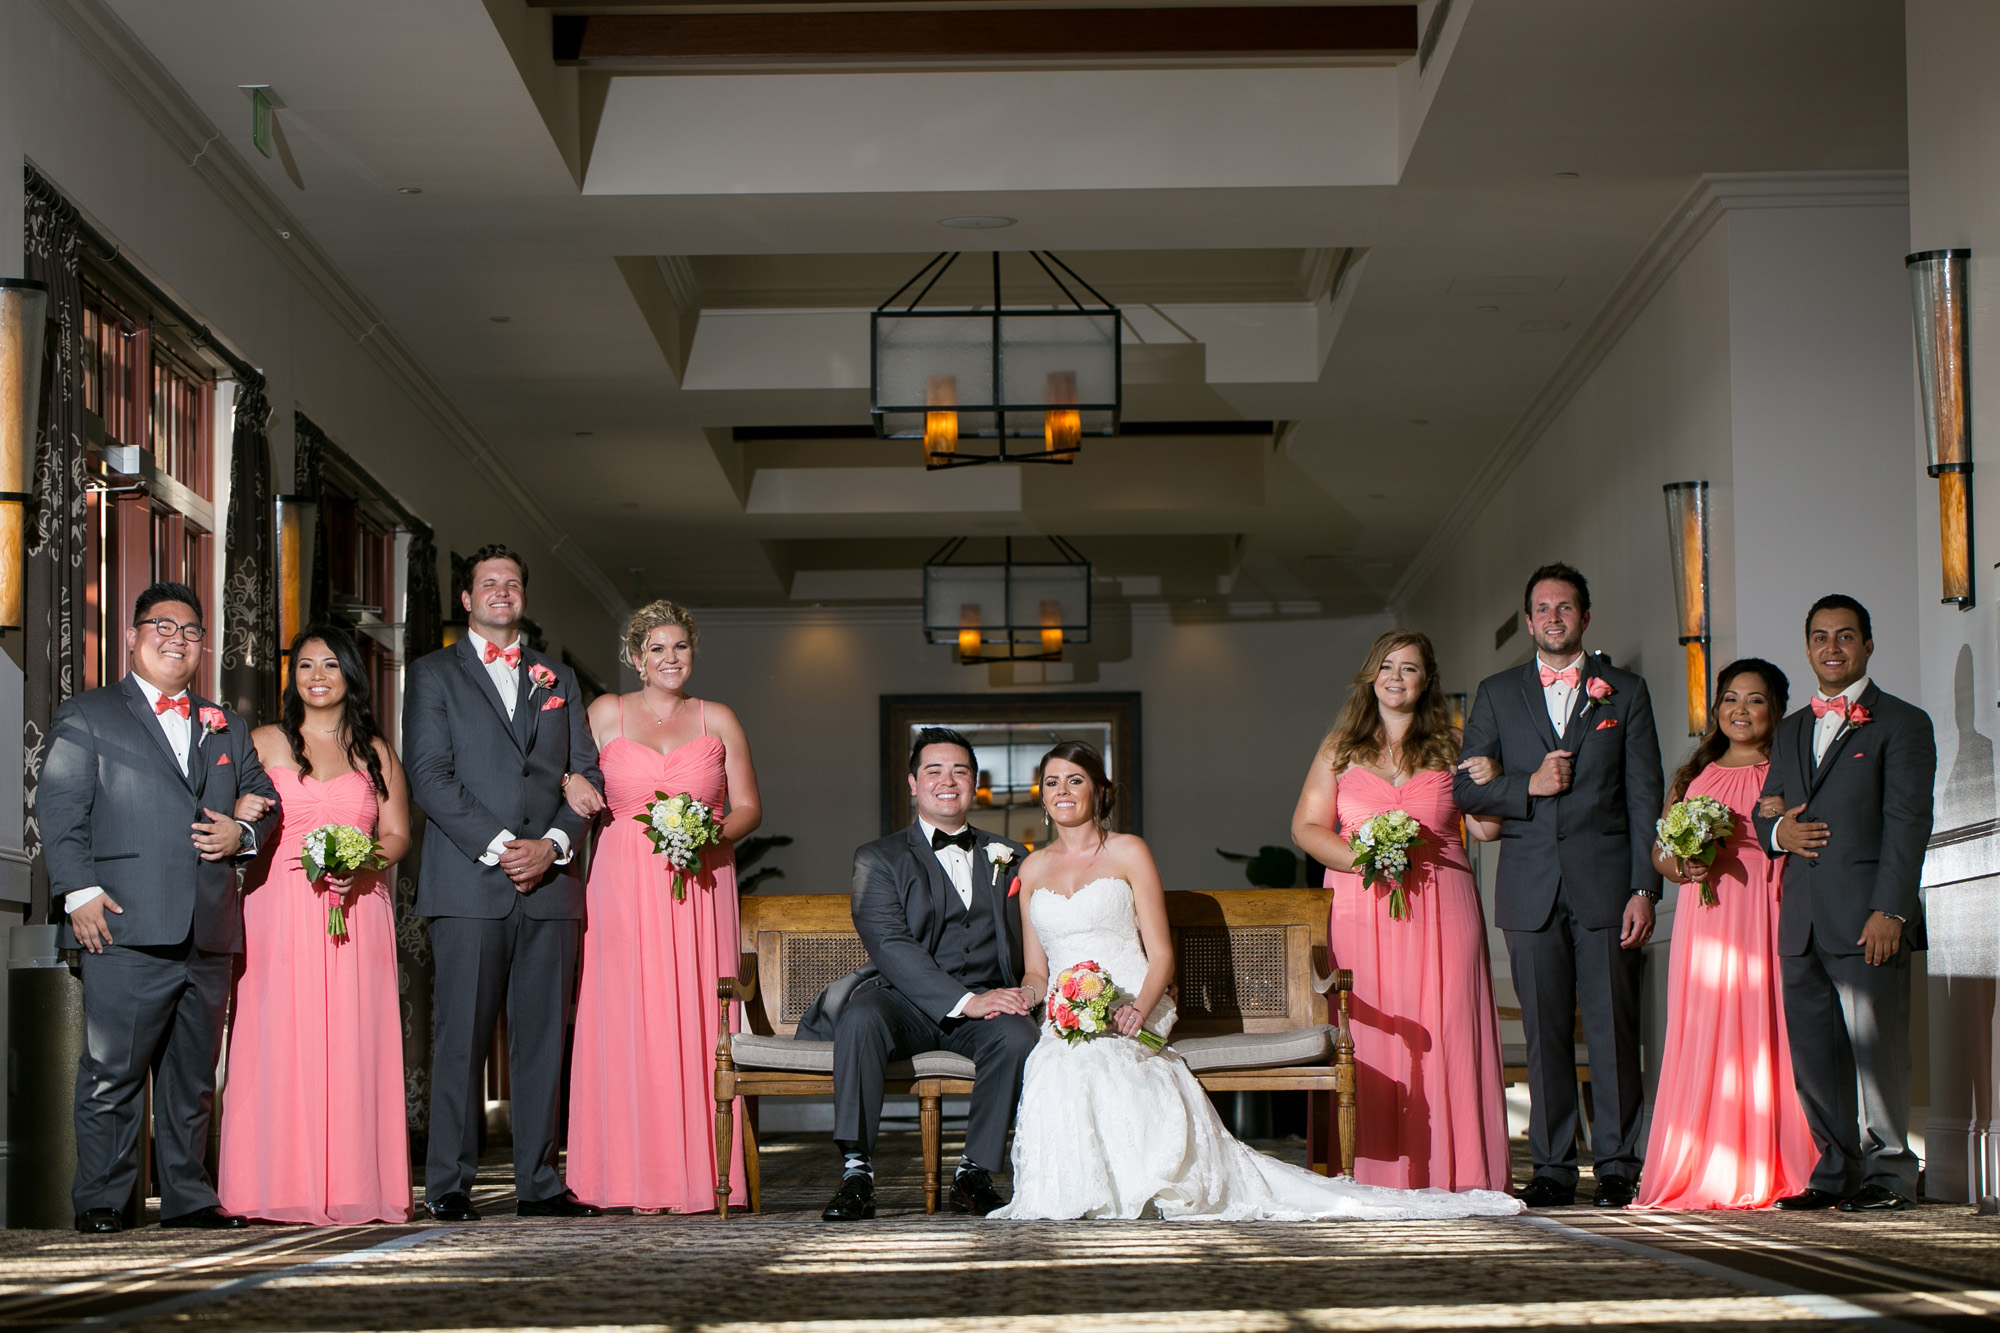 Geoff Kowalchuk BM Wedding Photography-018.jpg